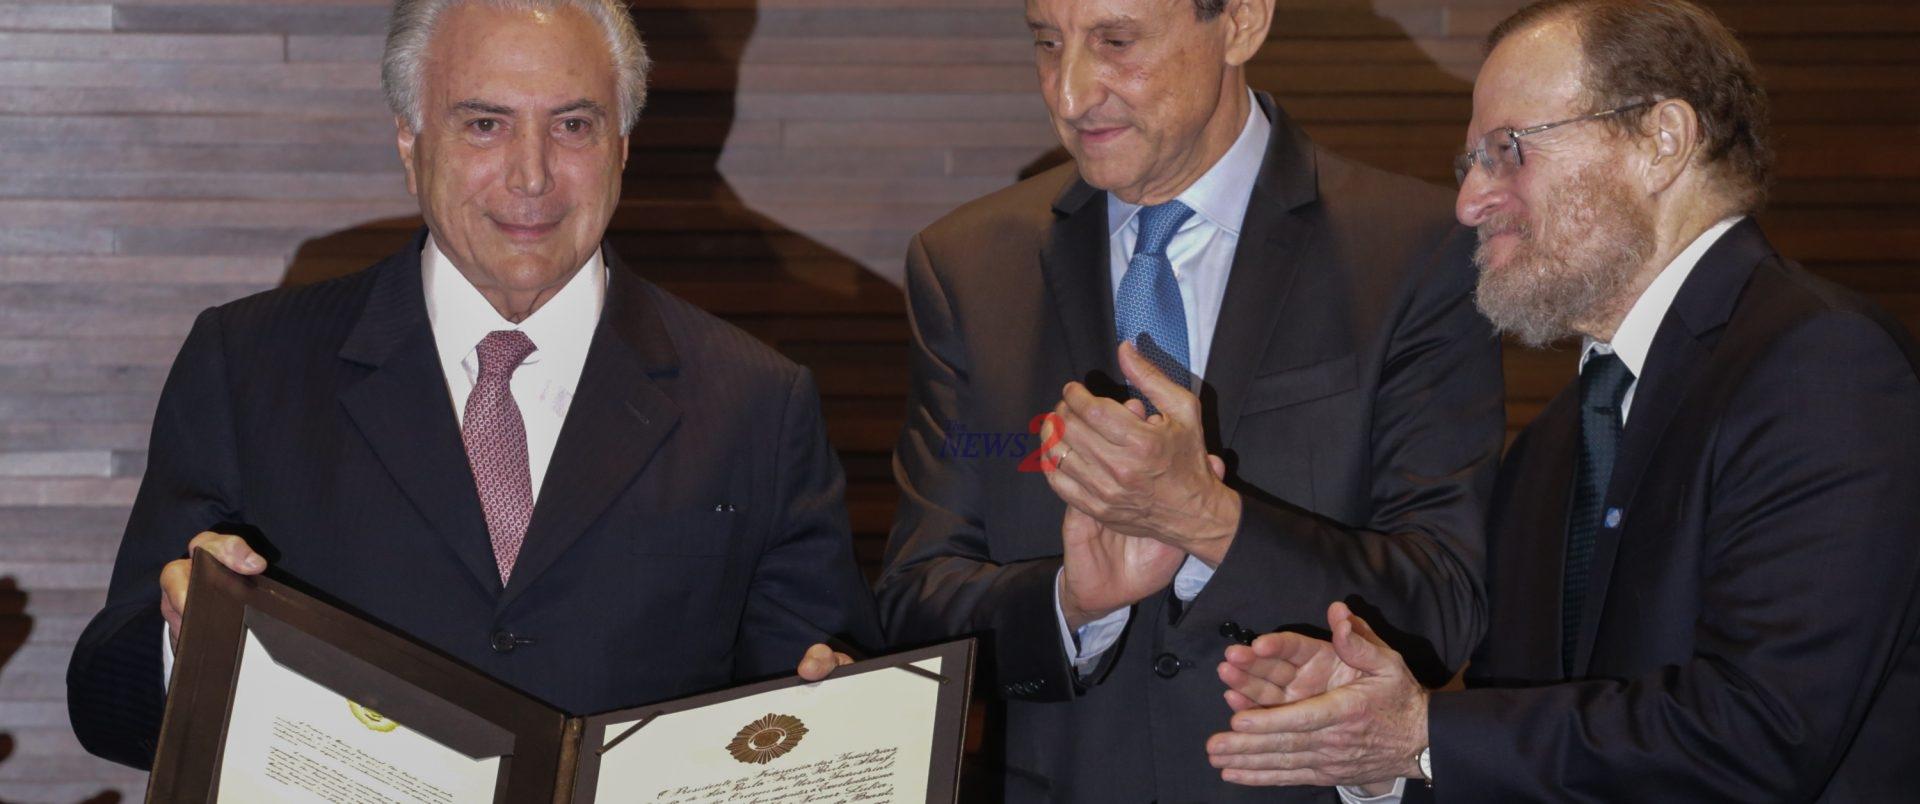 Brazilian President Michel Temer Receives An Award